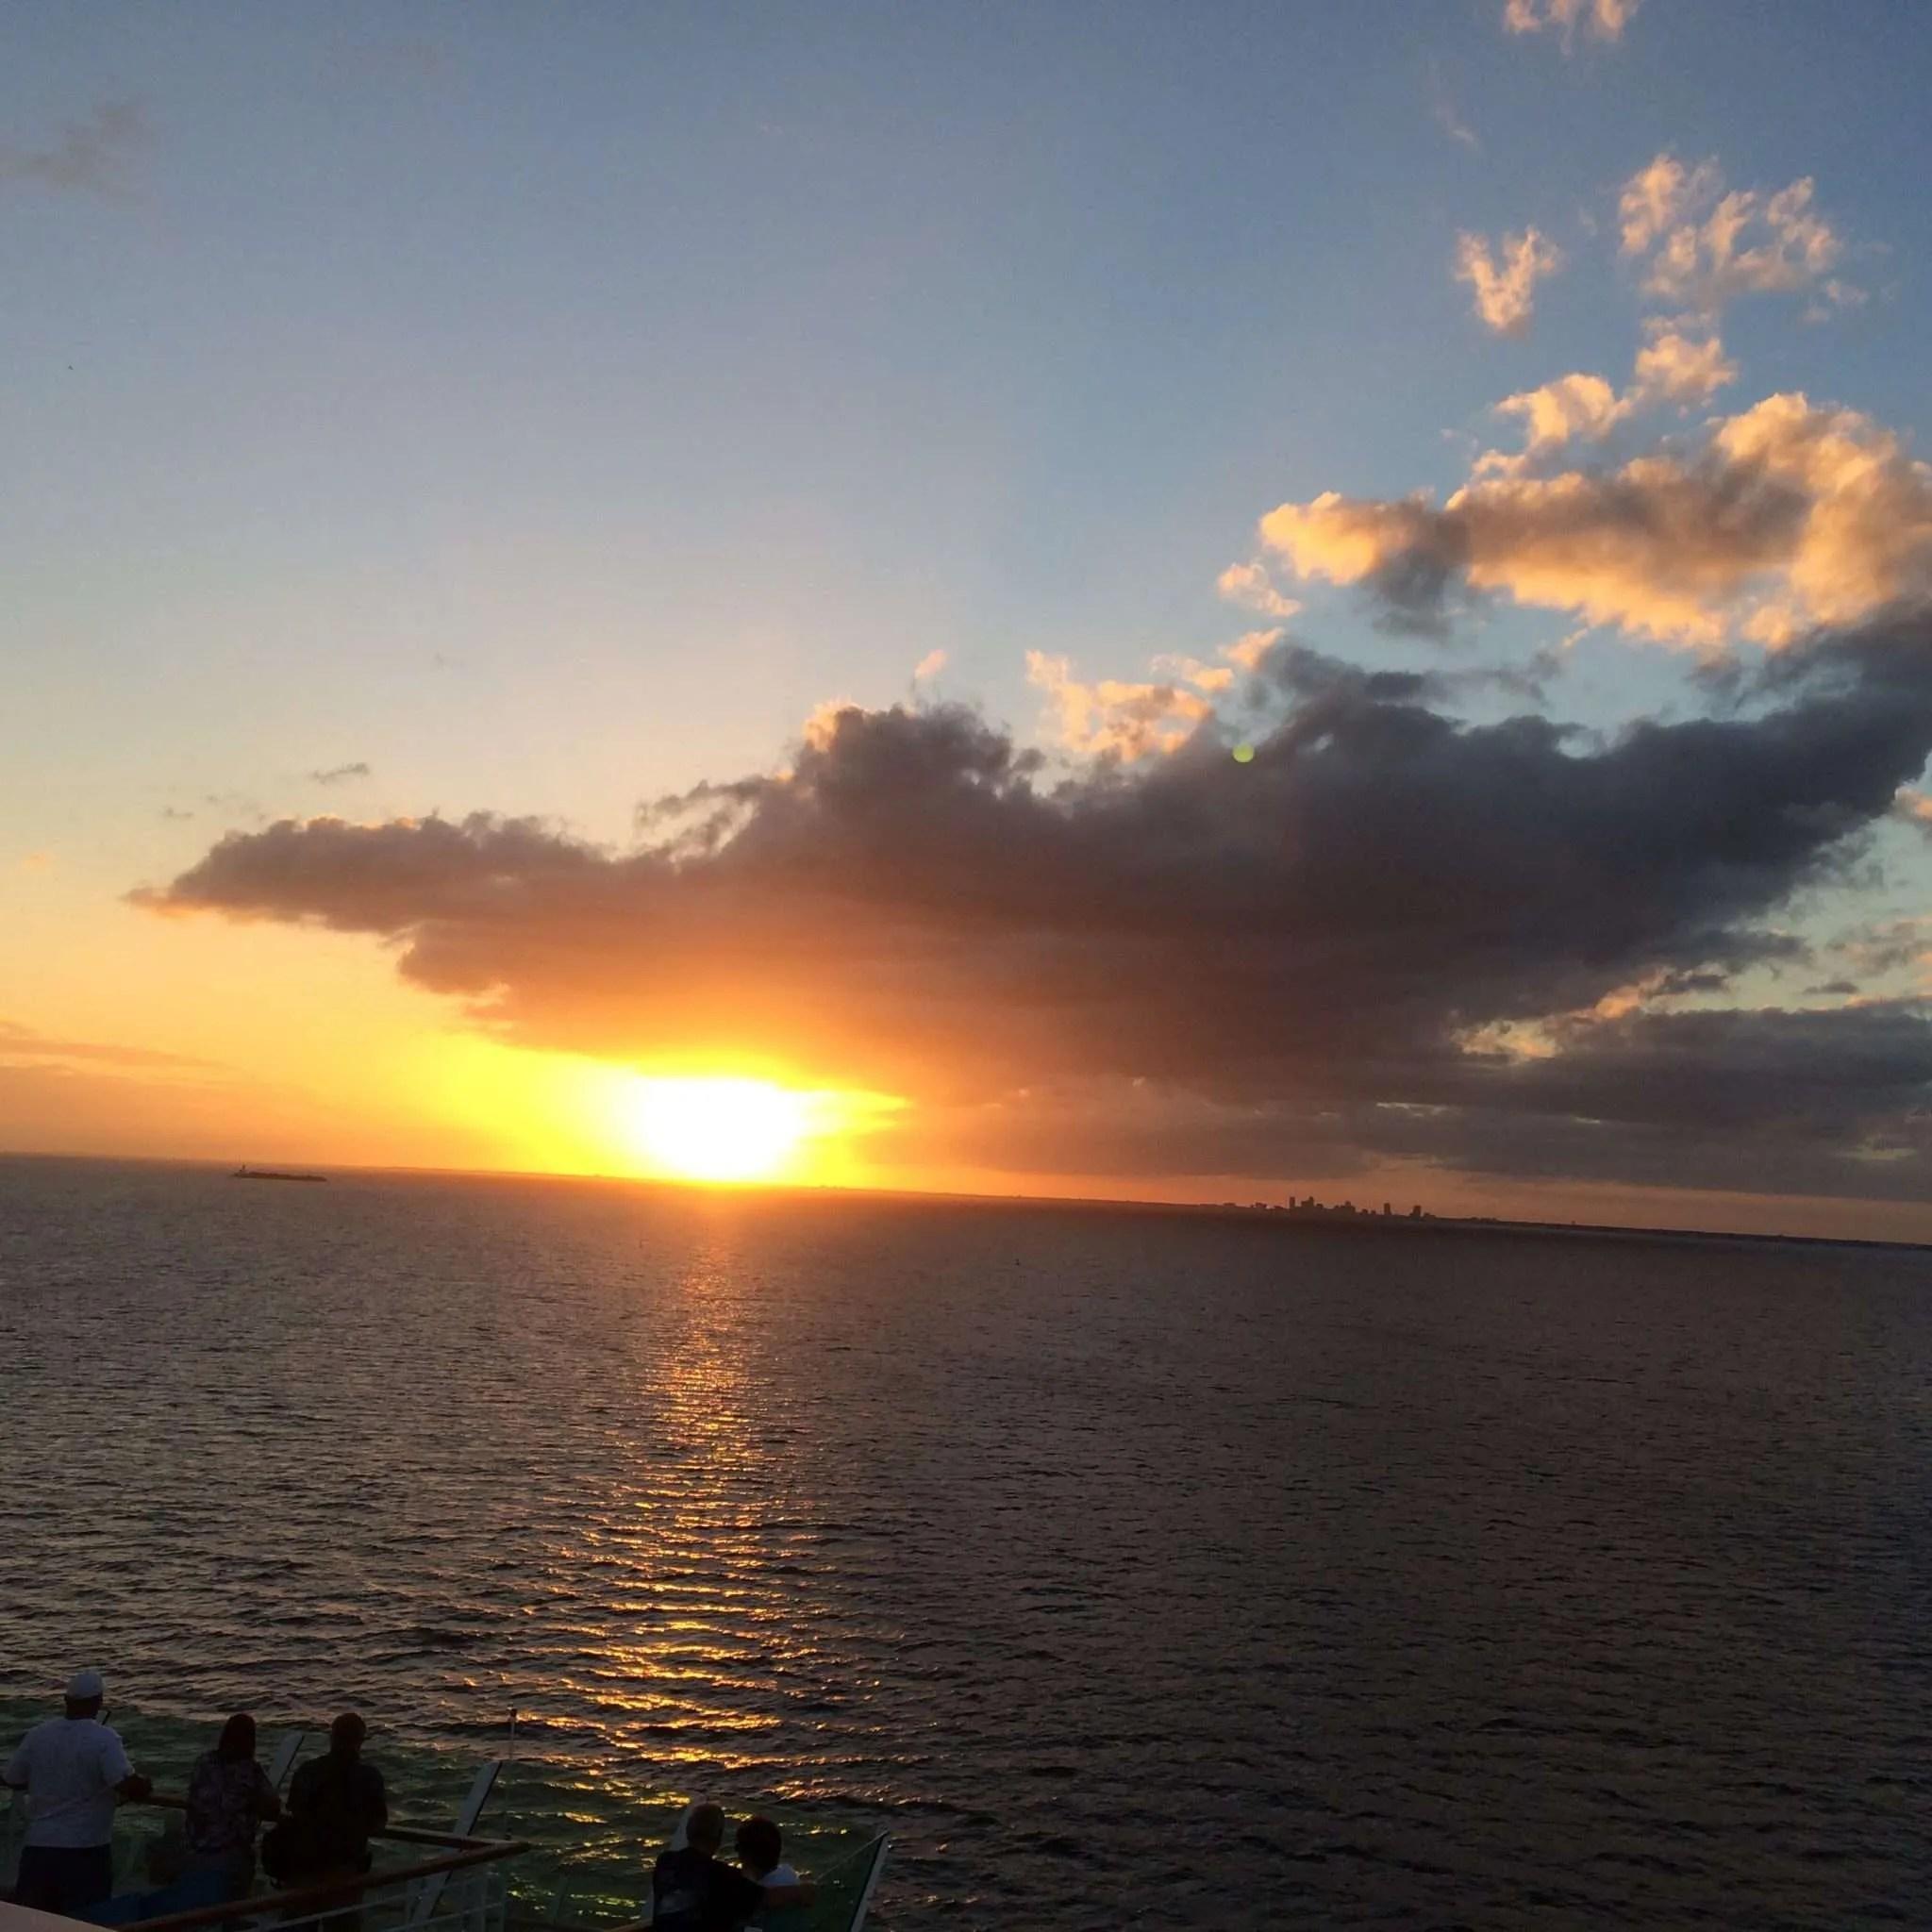 The sunset was beautiful!